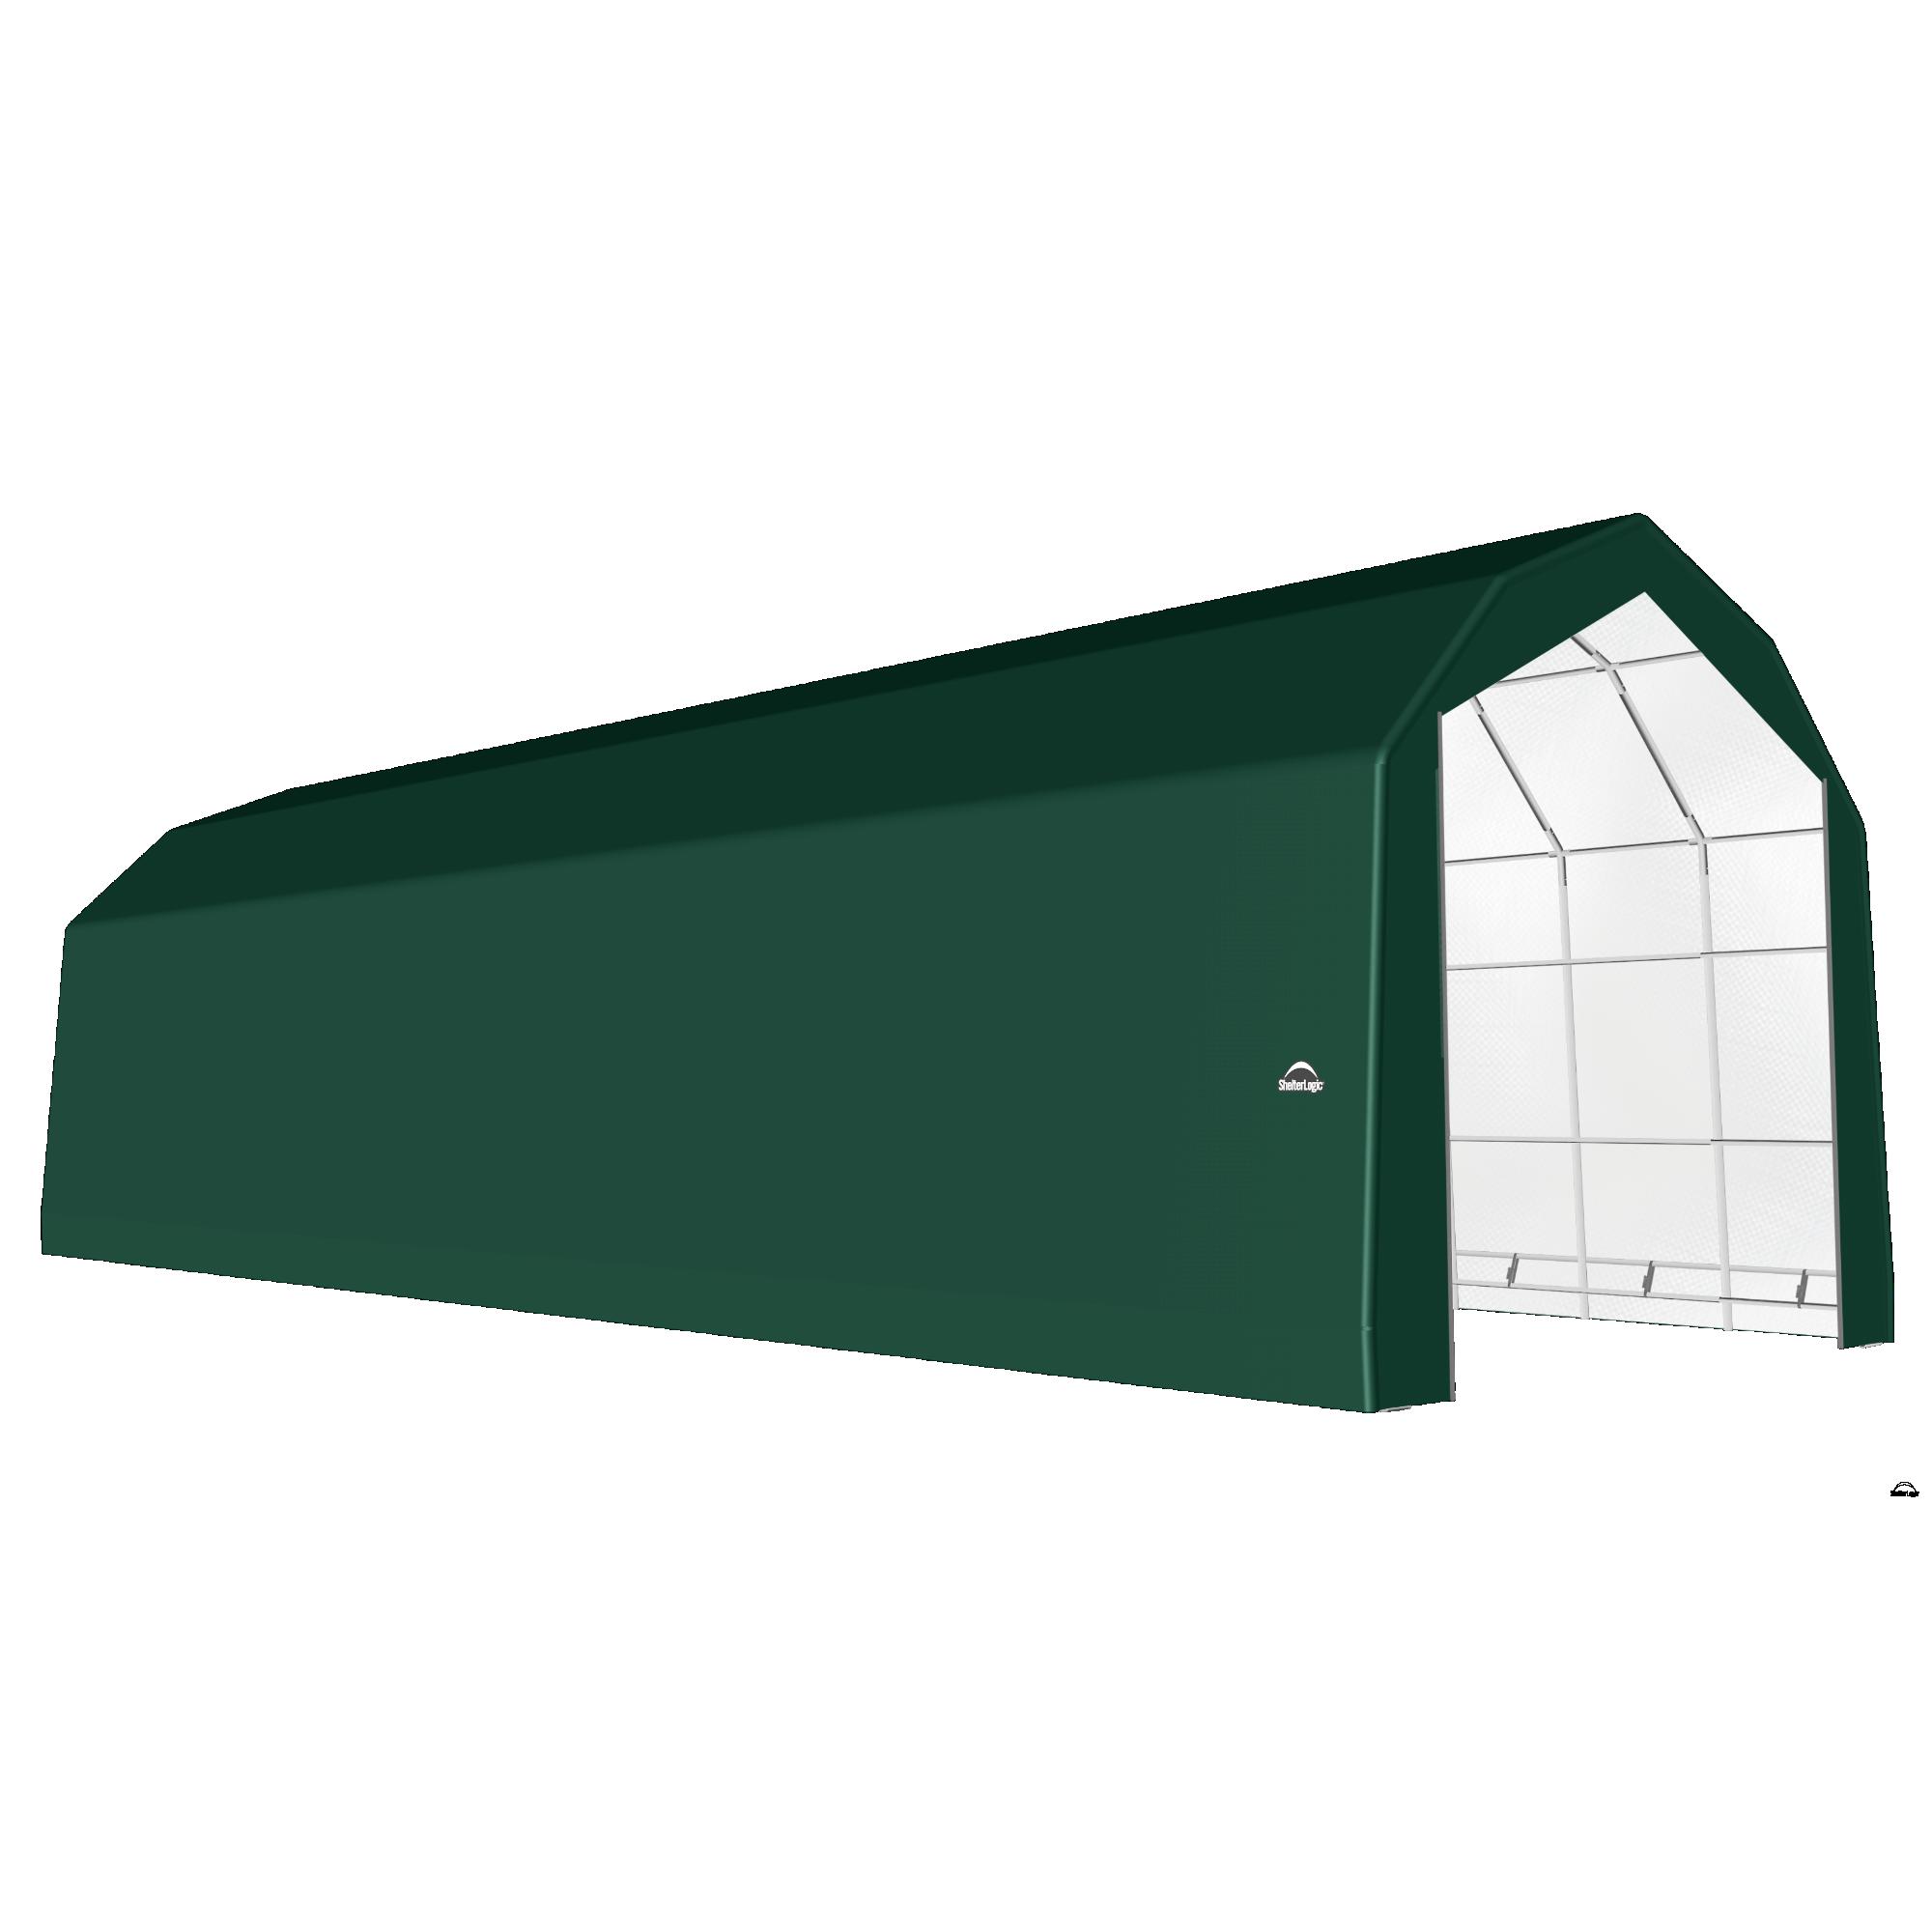 SP Barn 20X52X18 Green 14 oz PE Shelter